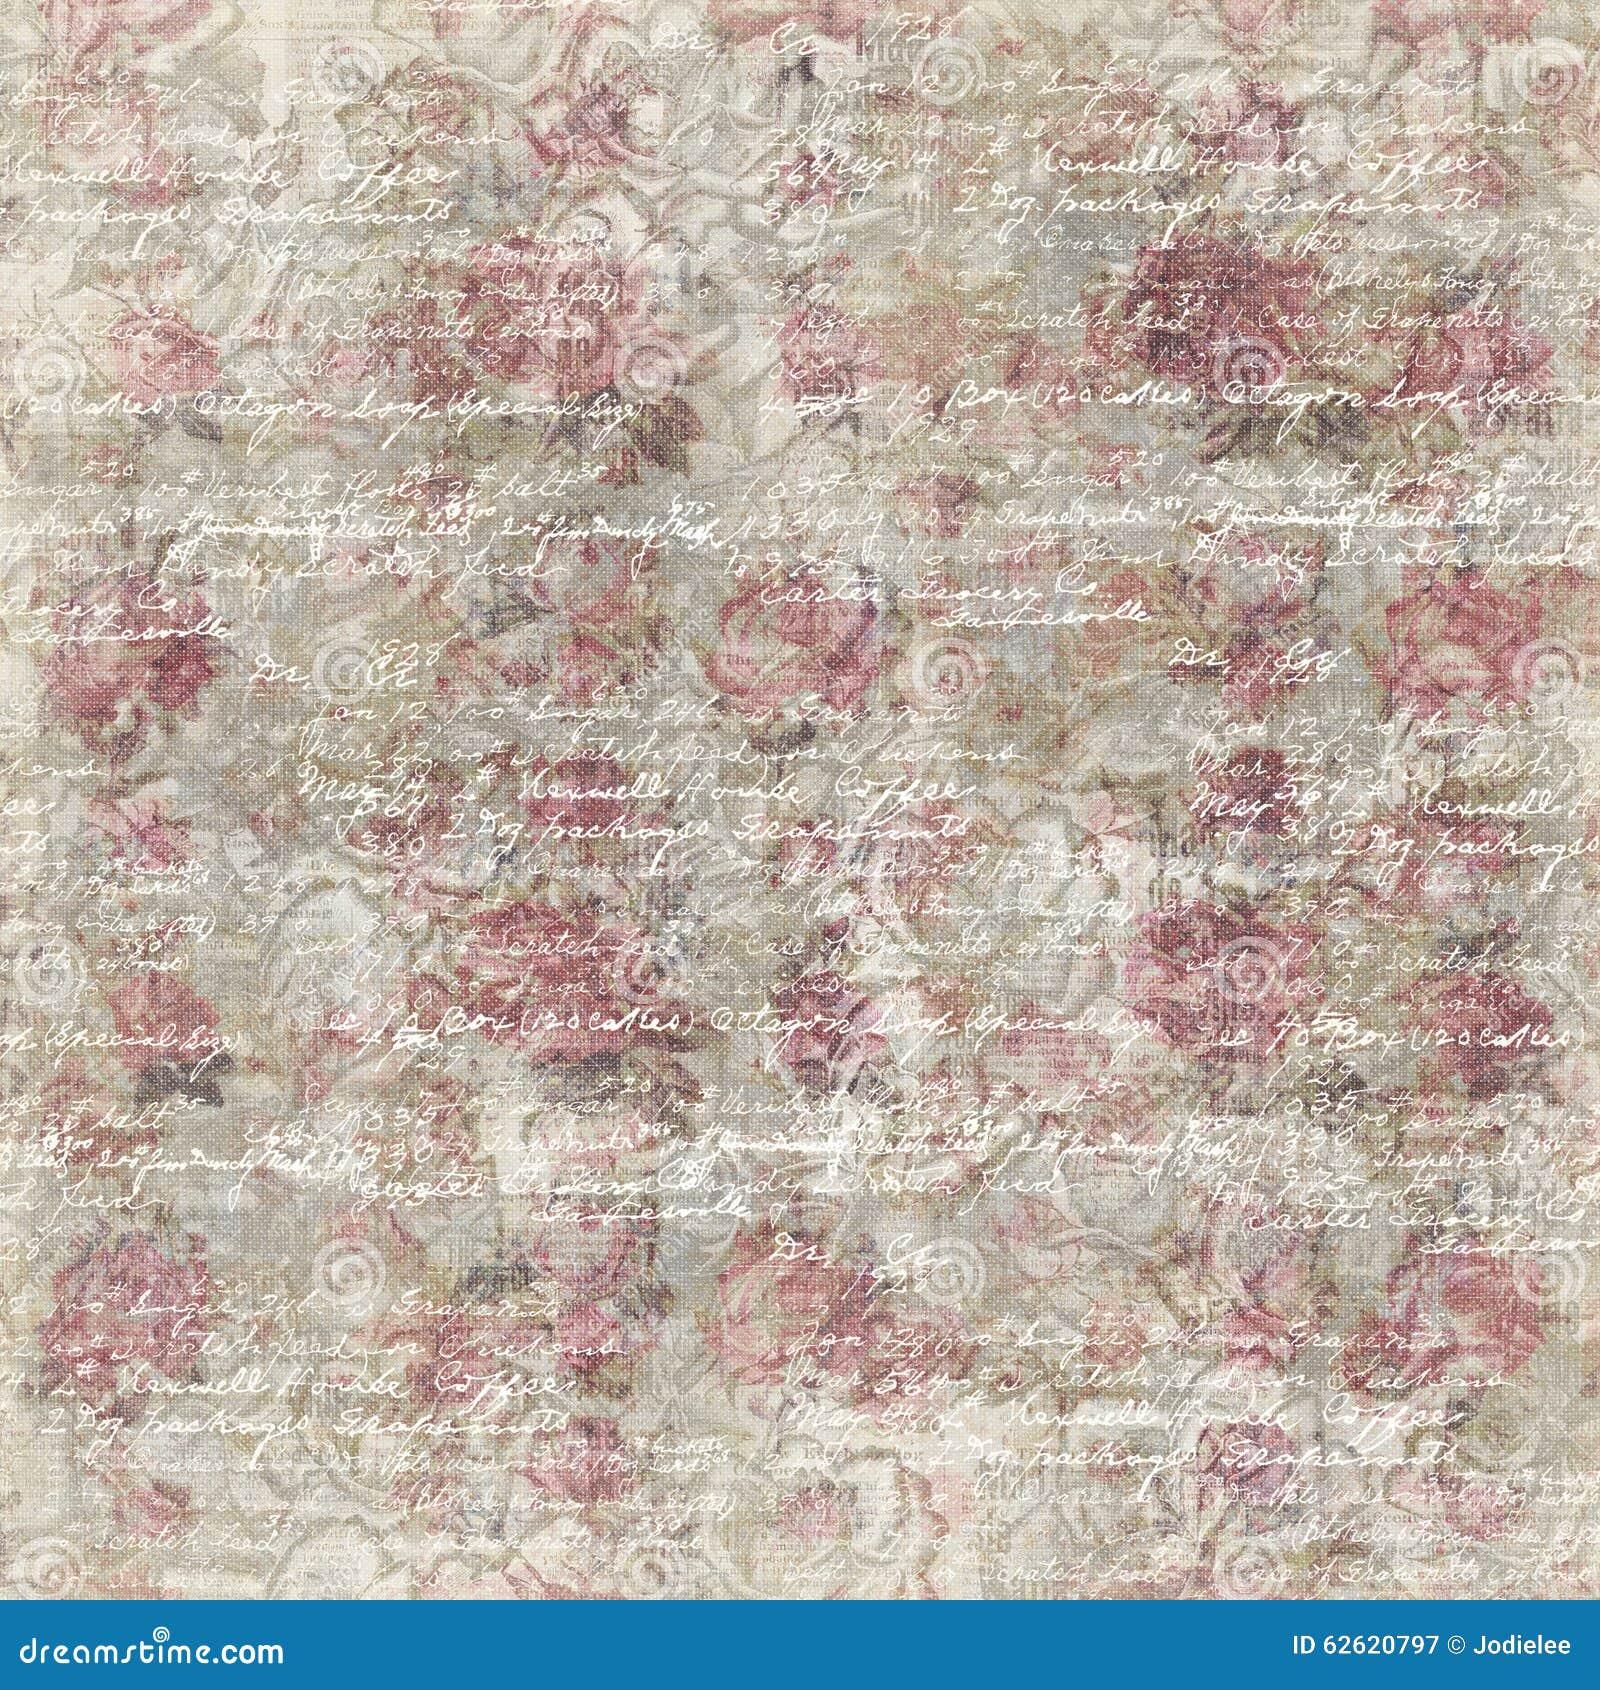 Grungy Vintage Rose Flower Botanical Wallpaper Background Repeat